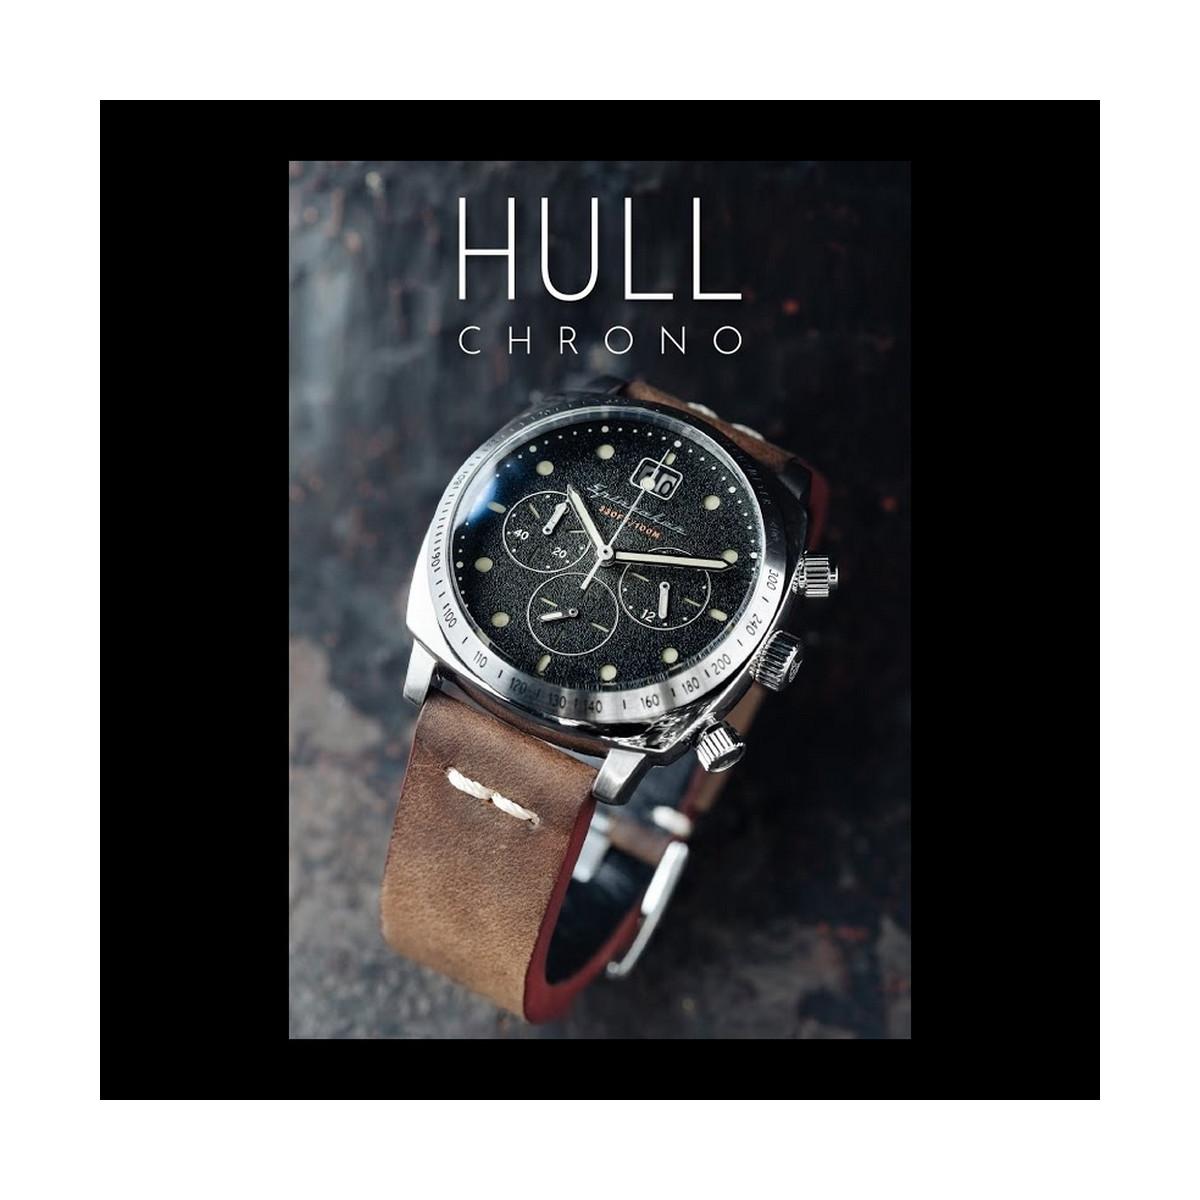 Montre Homme Spinnaker HULL Chronographe Cadran noir Bracelet cuir marron